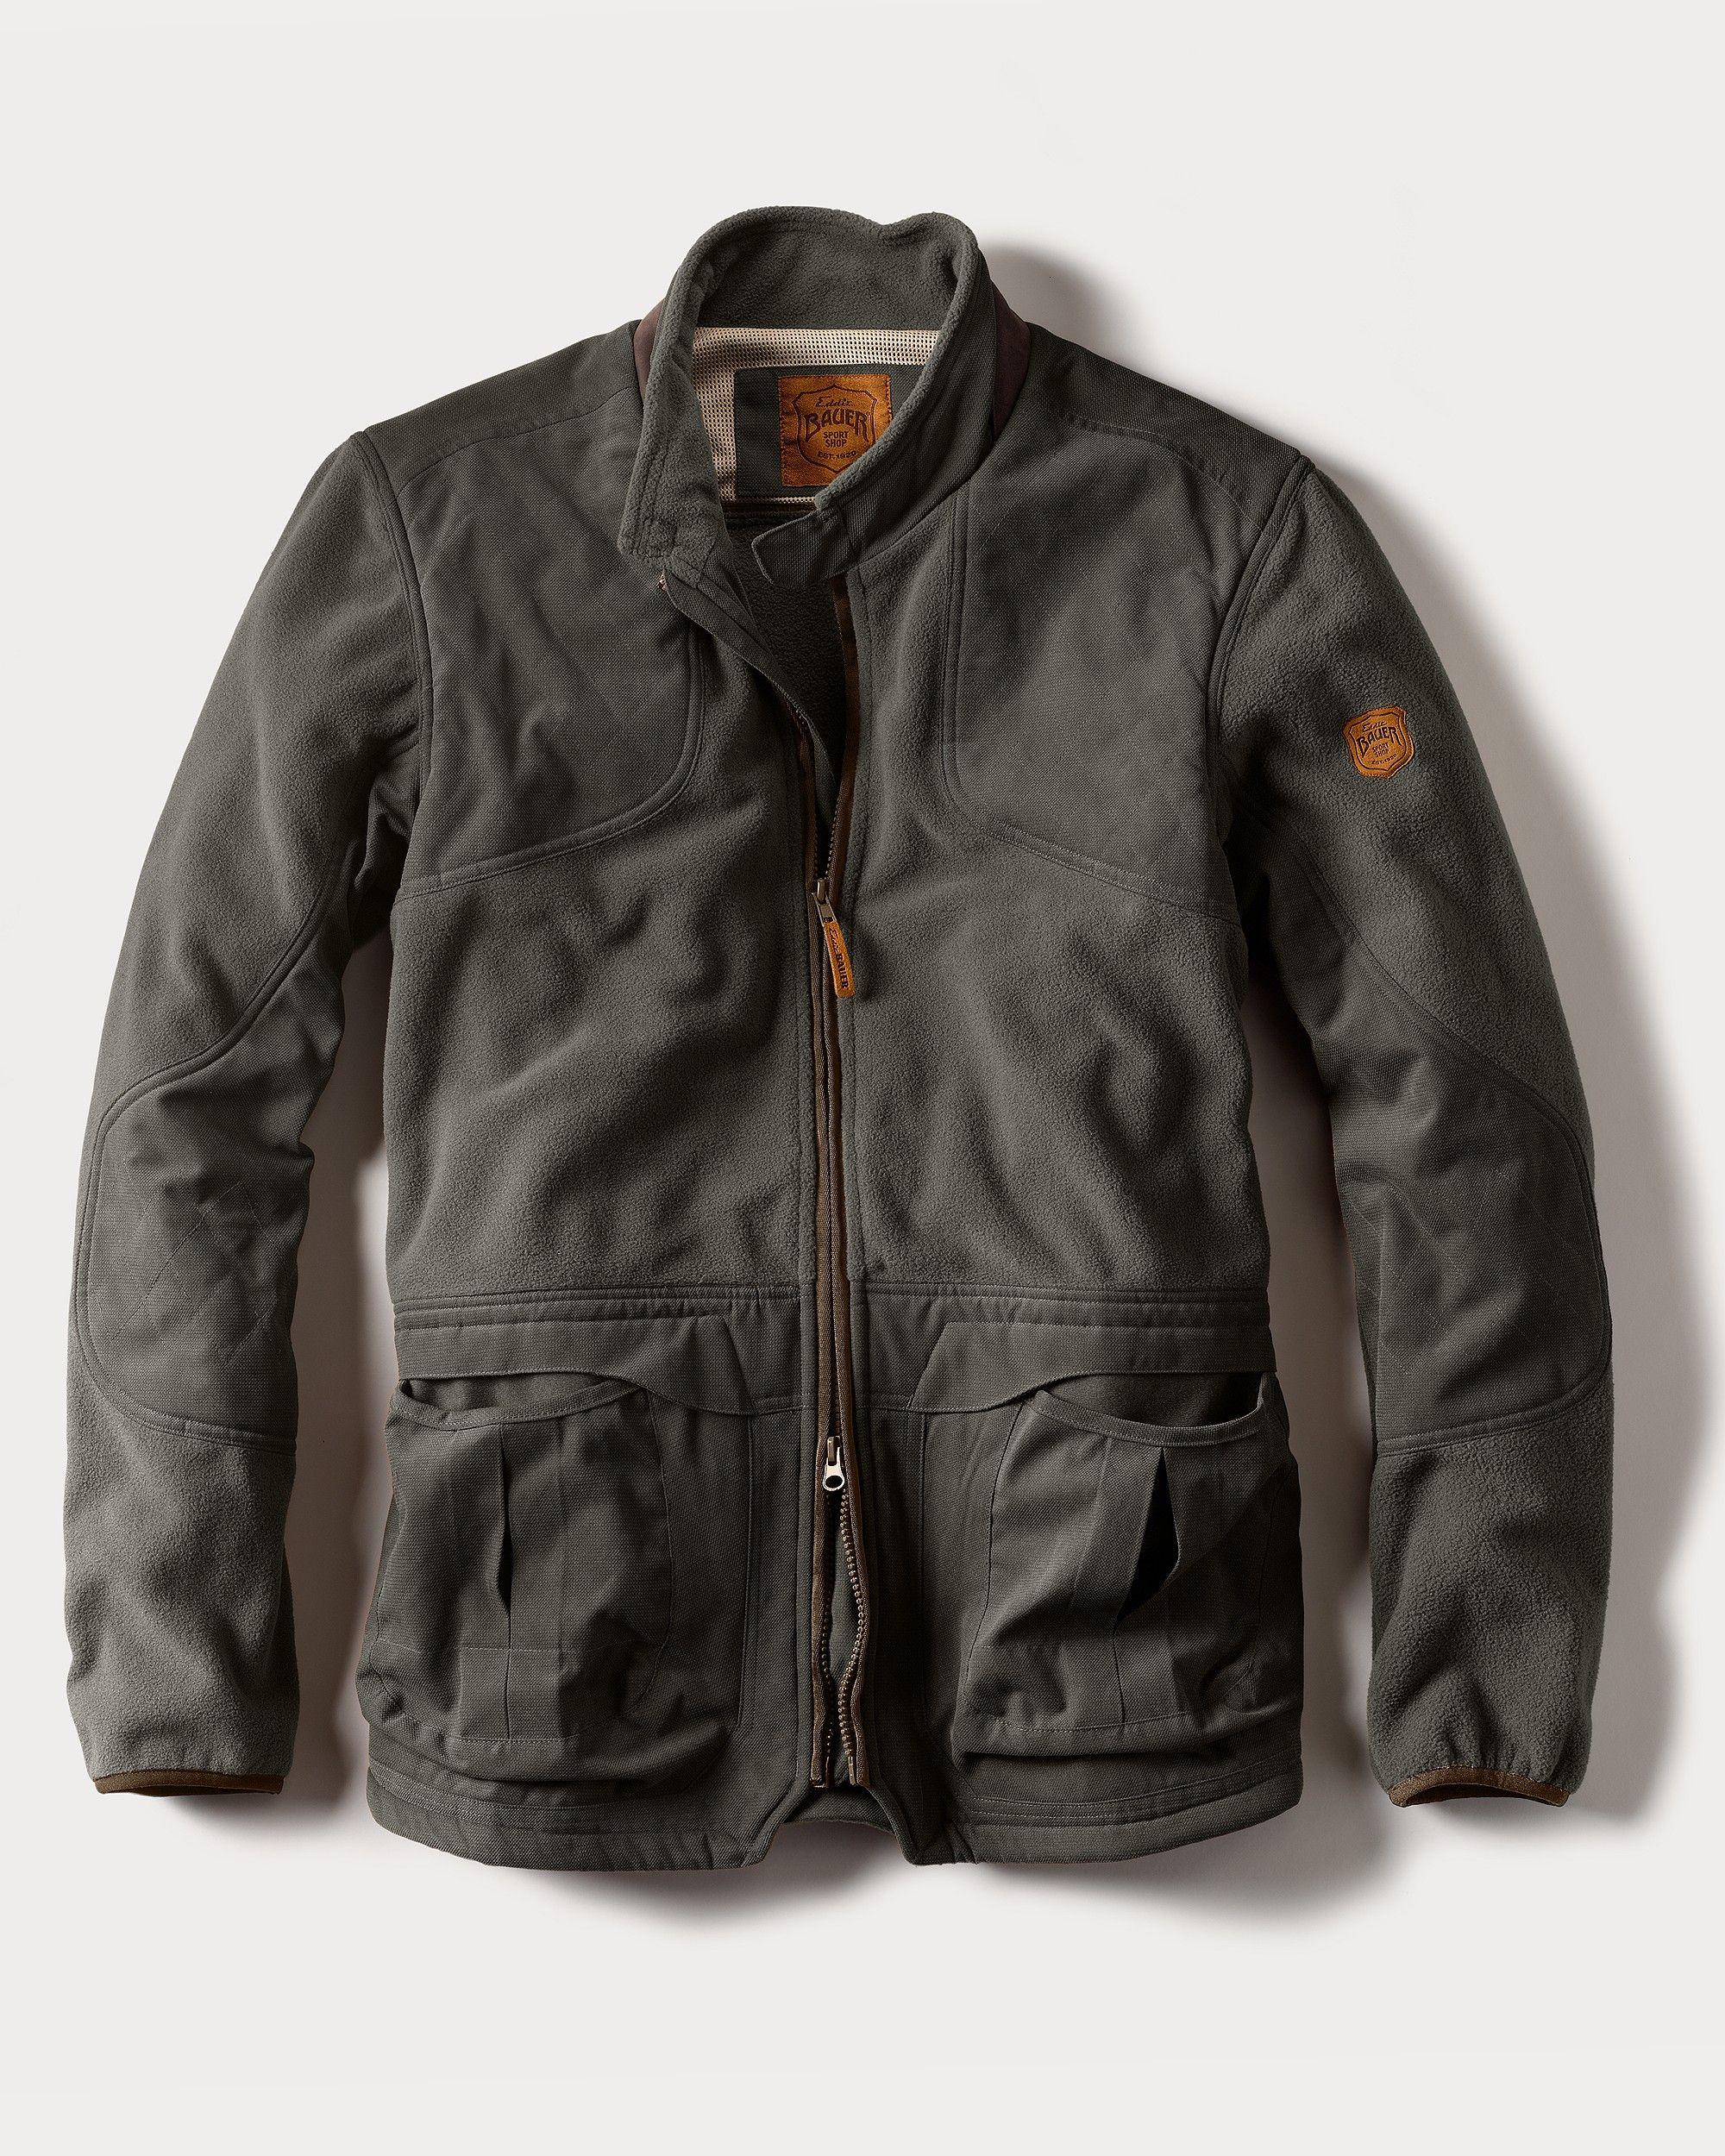 True Pair Fleece Shooting Jacket Ed Bauer Stylin